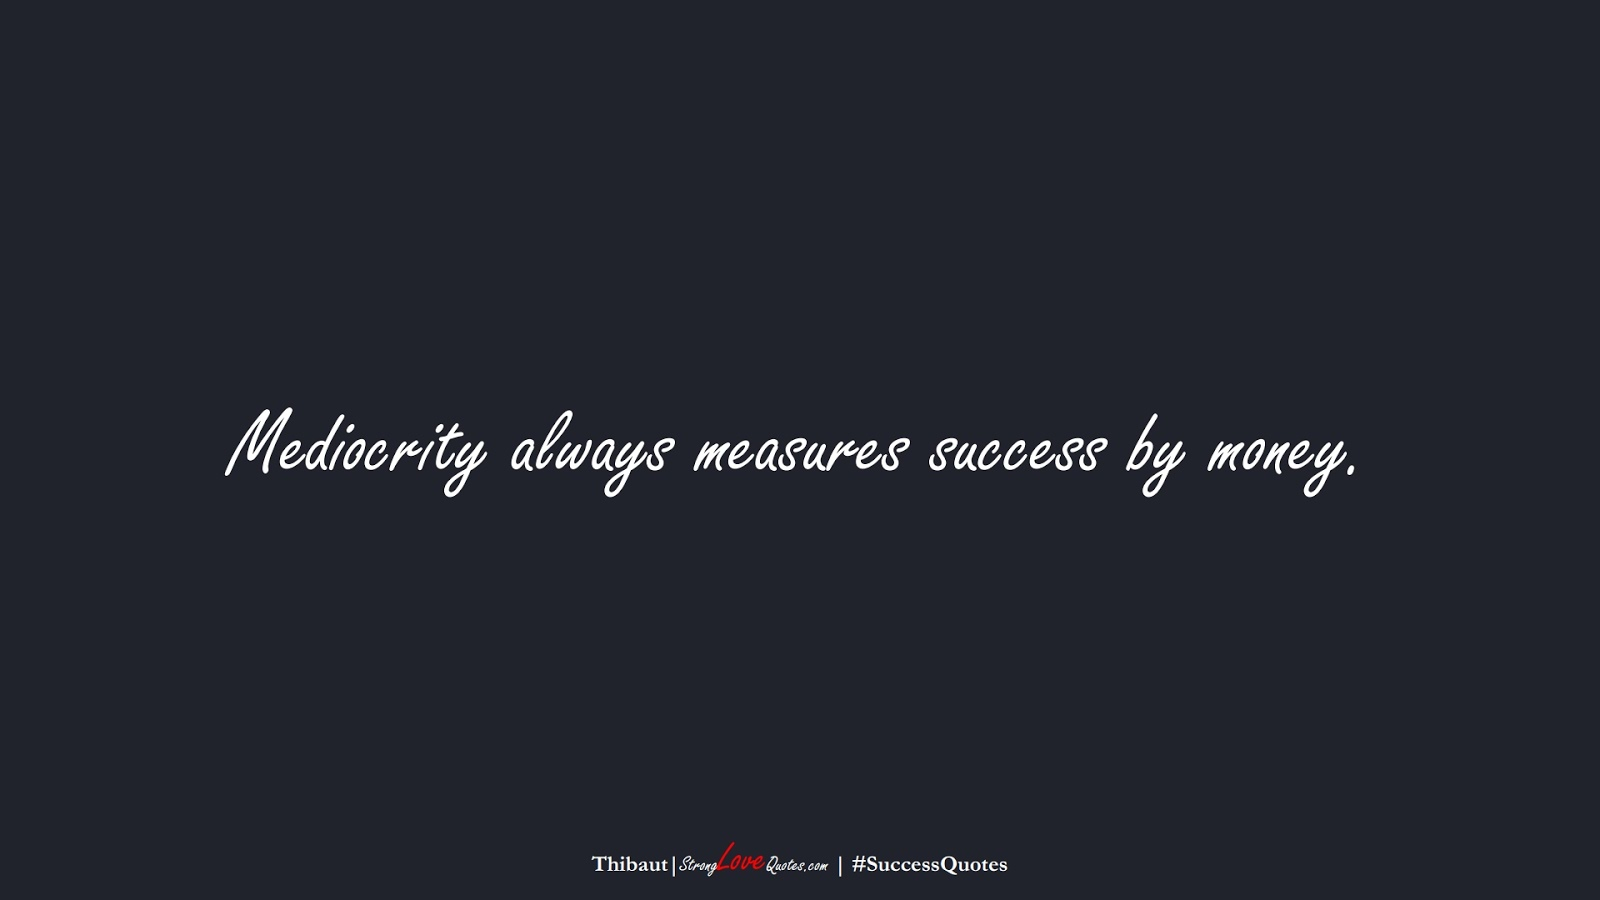 Mediocrity always measures success by money. (Thibaut);  #SuccessQuotes